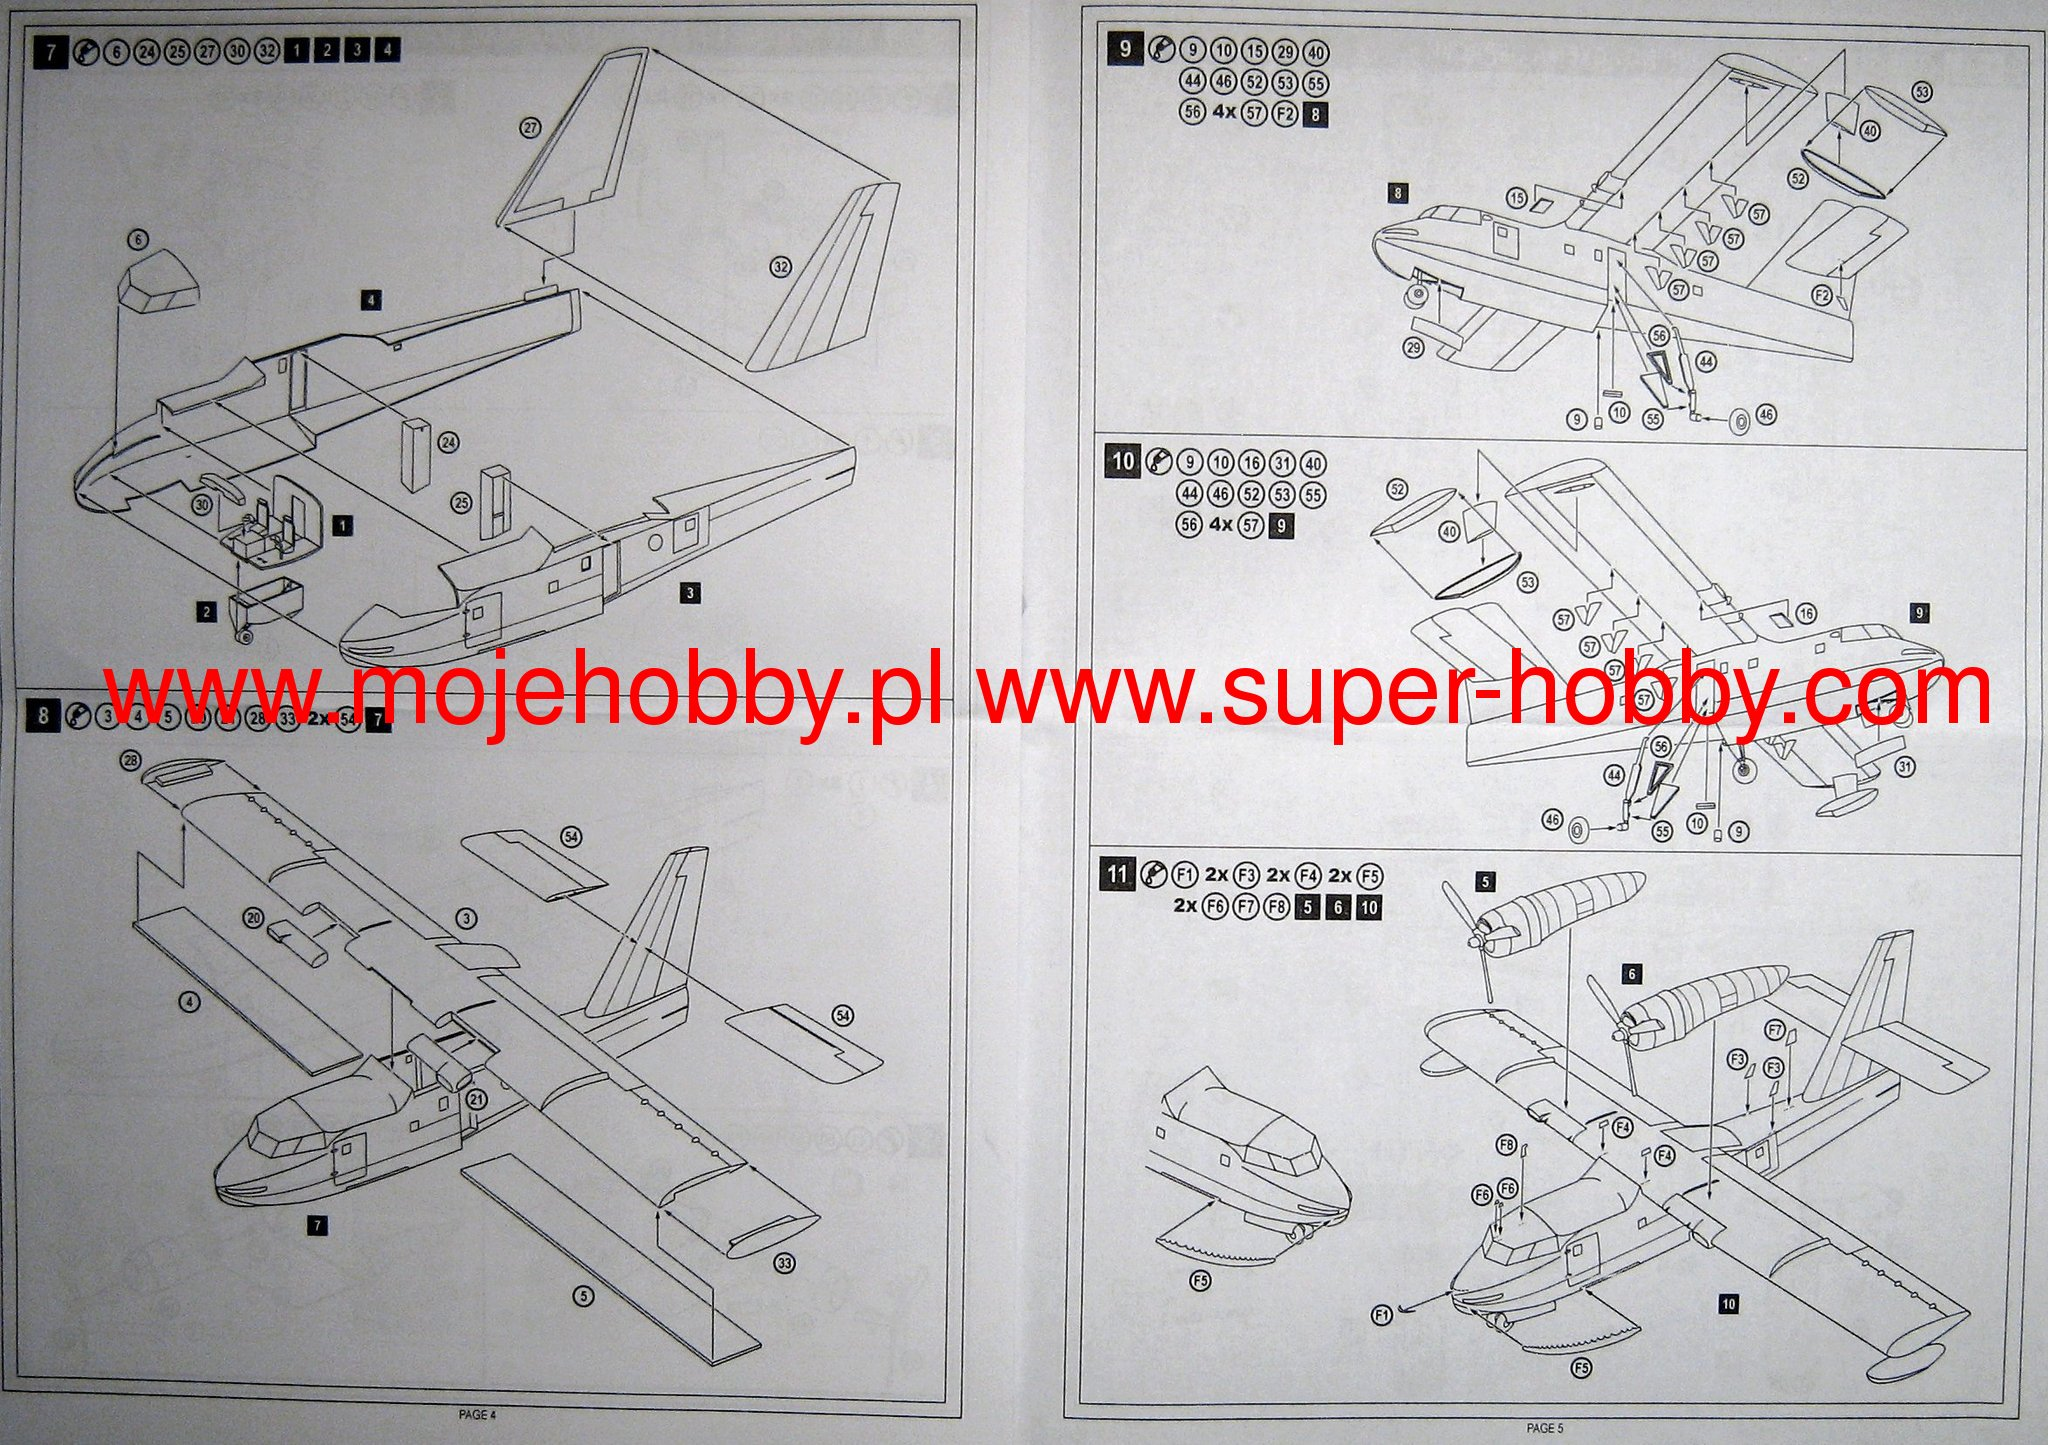 canadair aircraft wiring diagram wiring library Aircraft Headset Wiring 2_am01452_3 jpg canadair